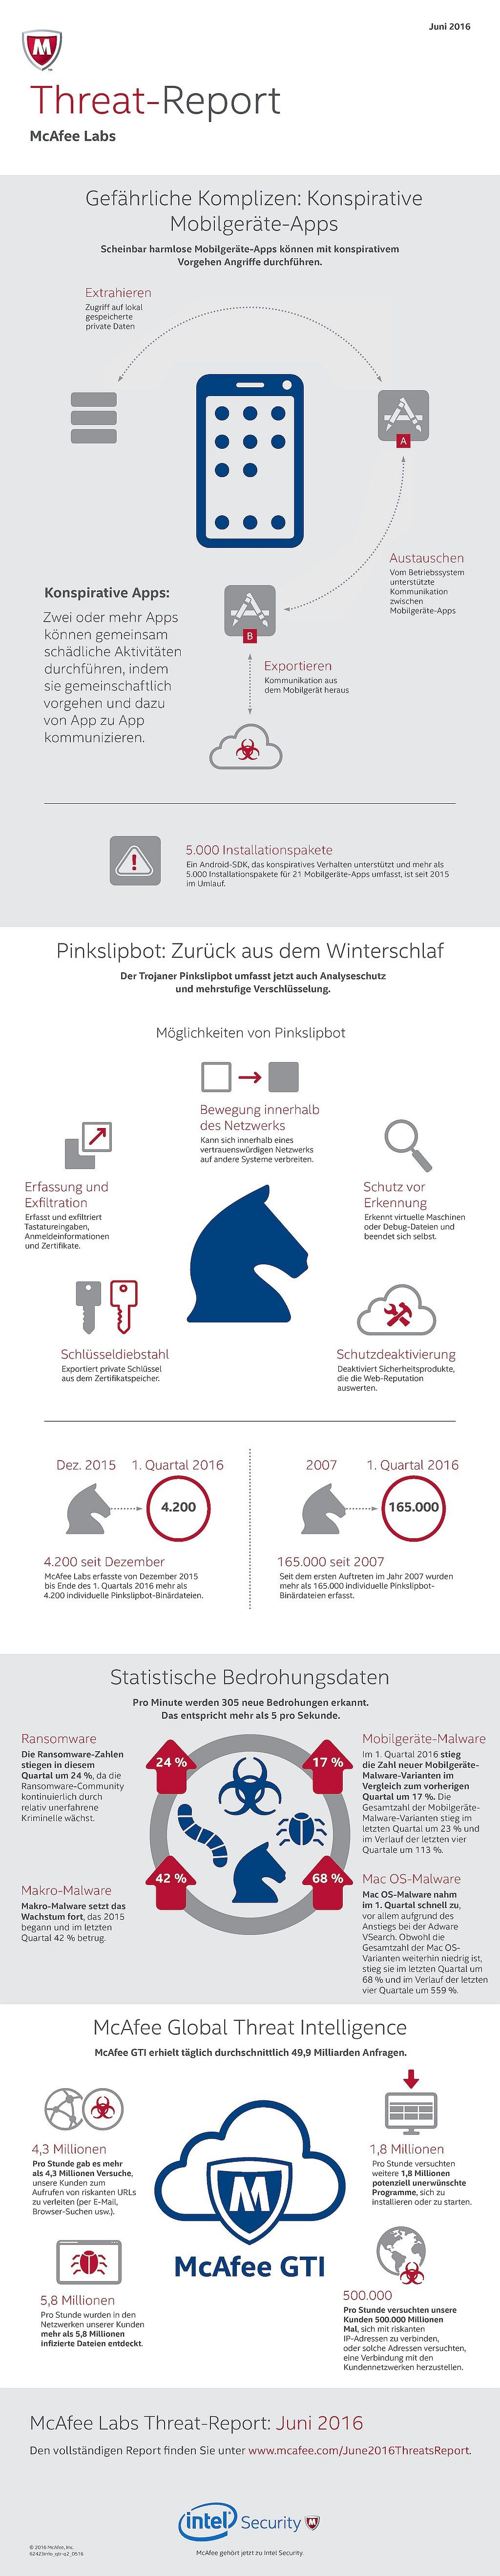 infografik intel security threats-report-may-2016